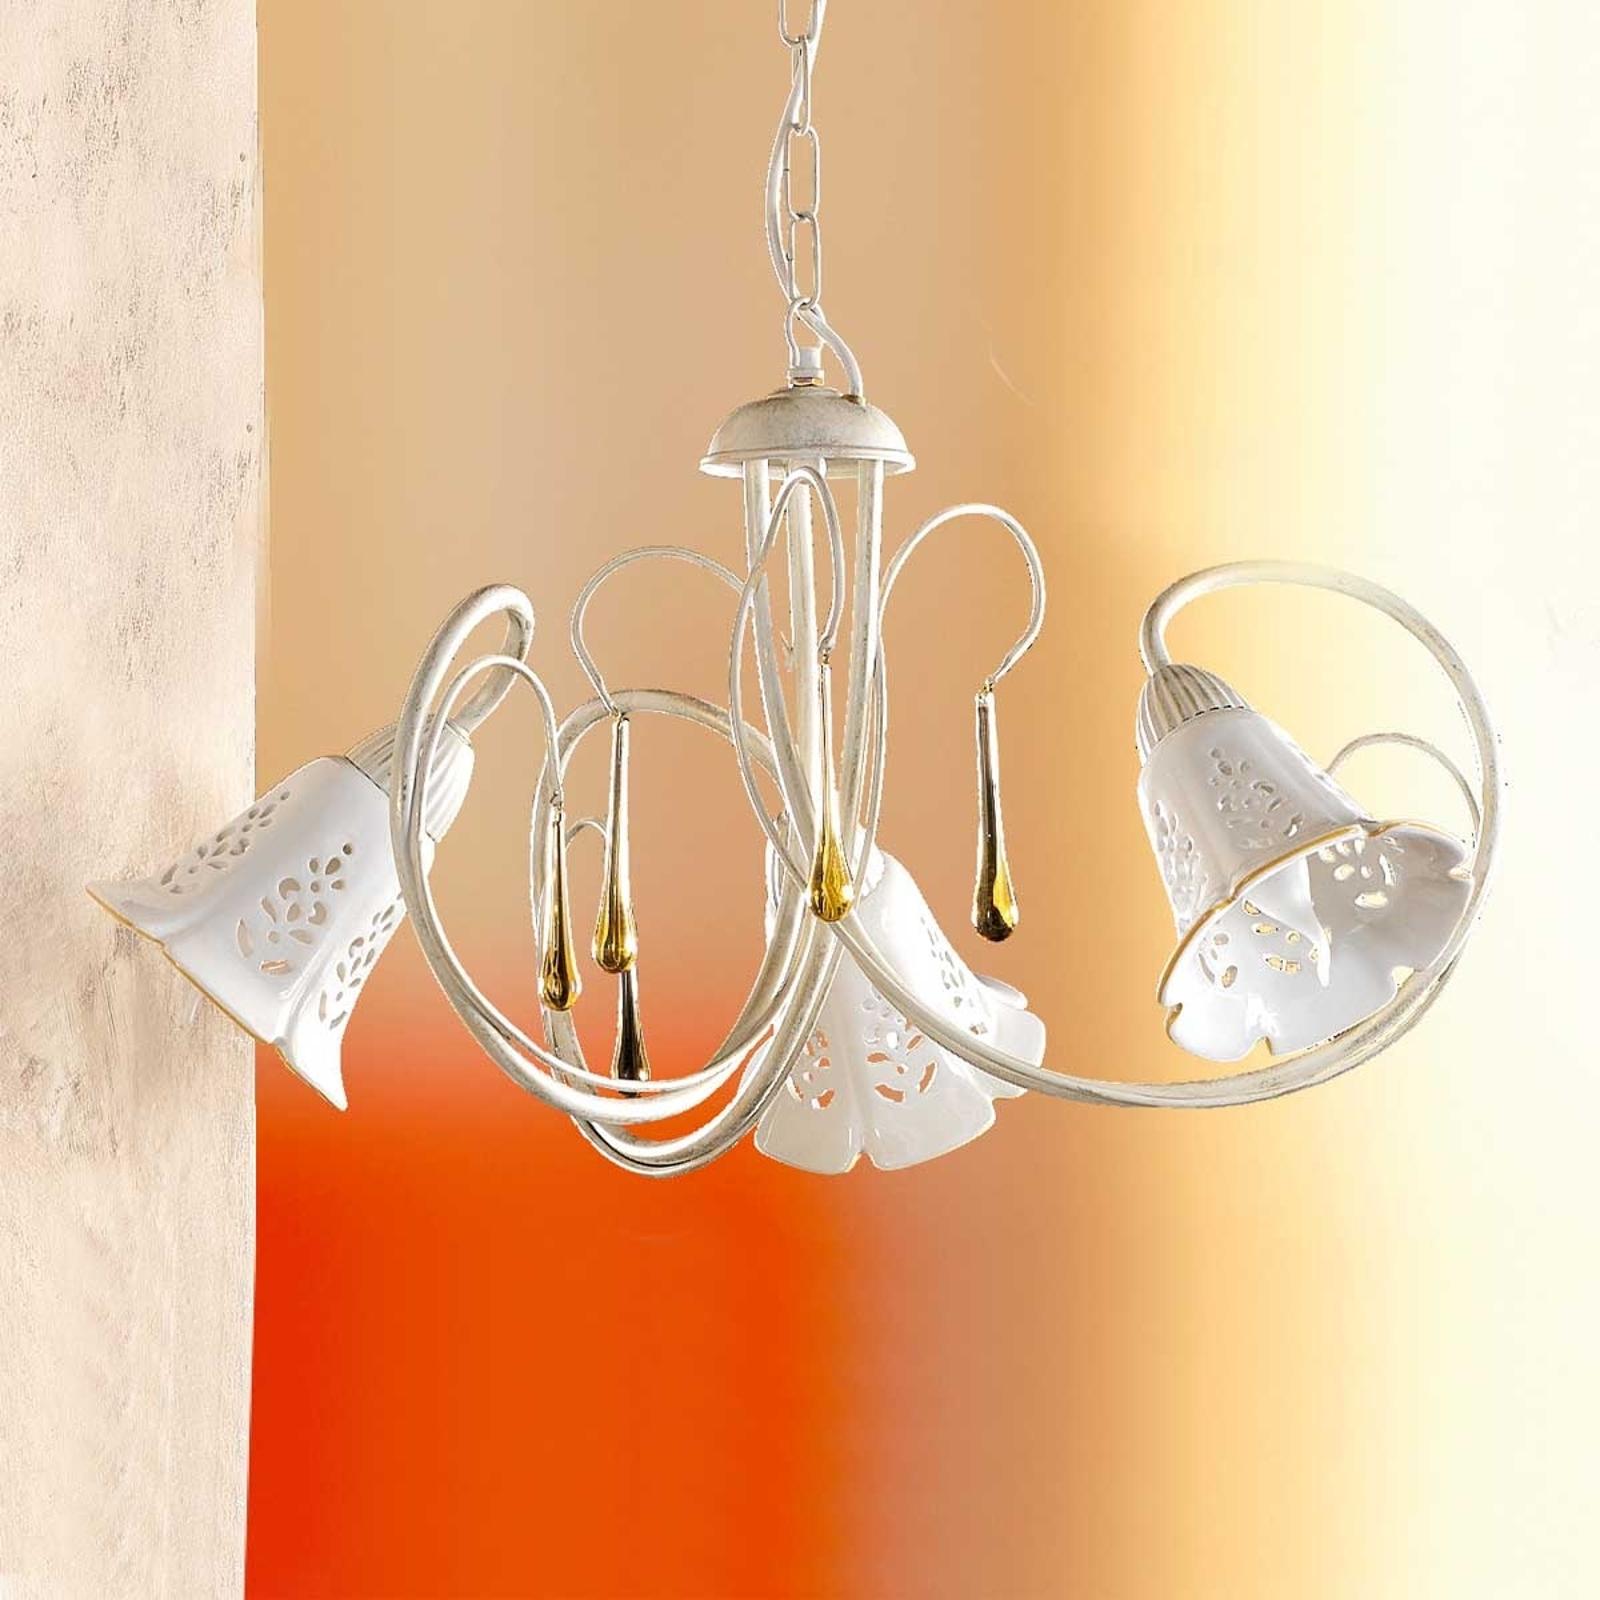 GOCCE hanging light, 3-bulb_2013076_1